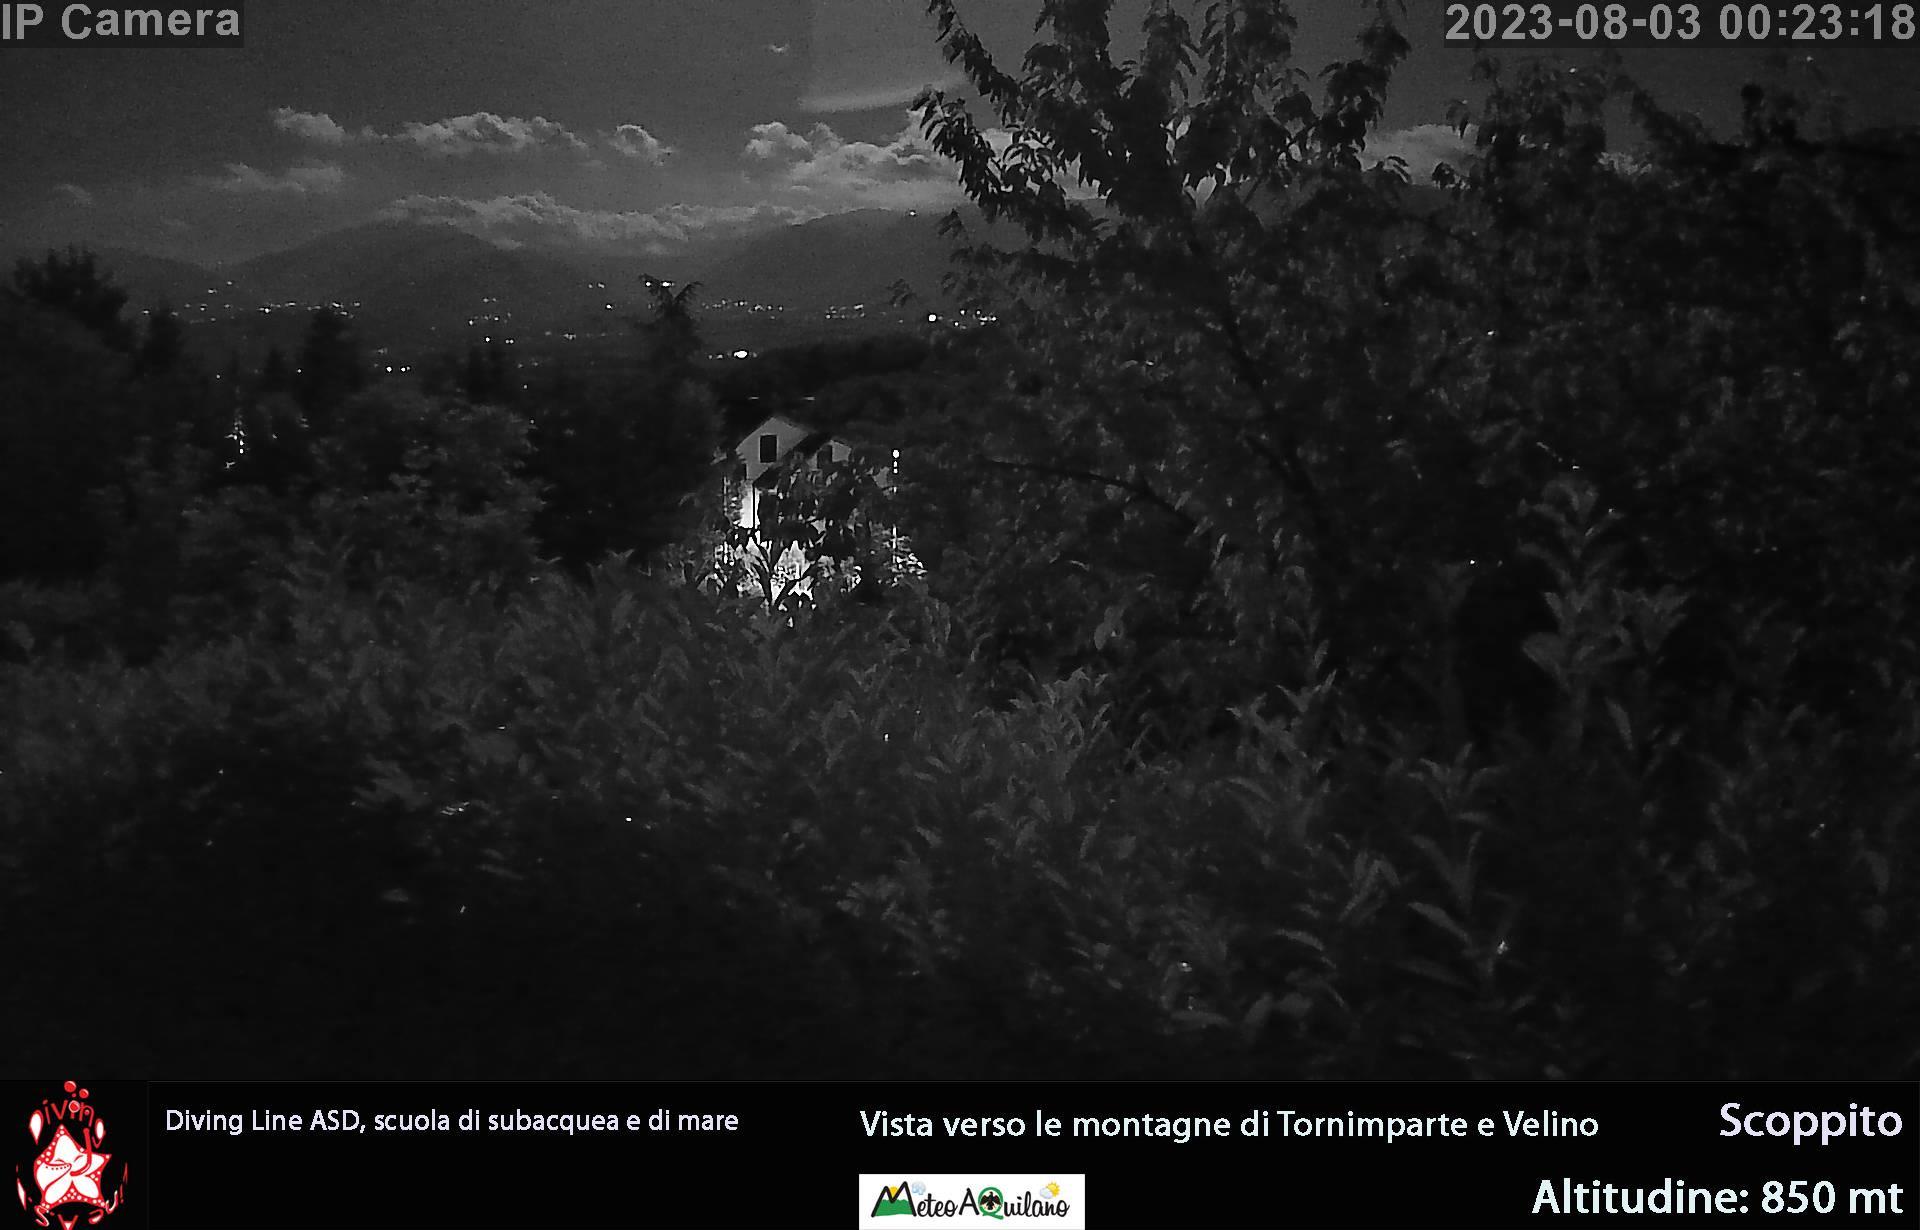 Webcam panoramica Scoppito